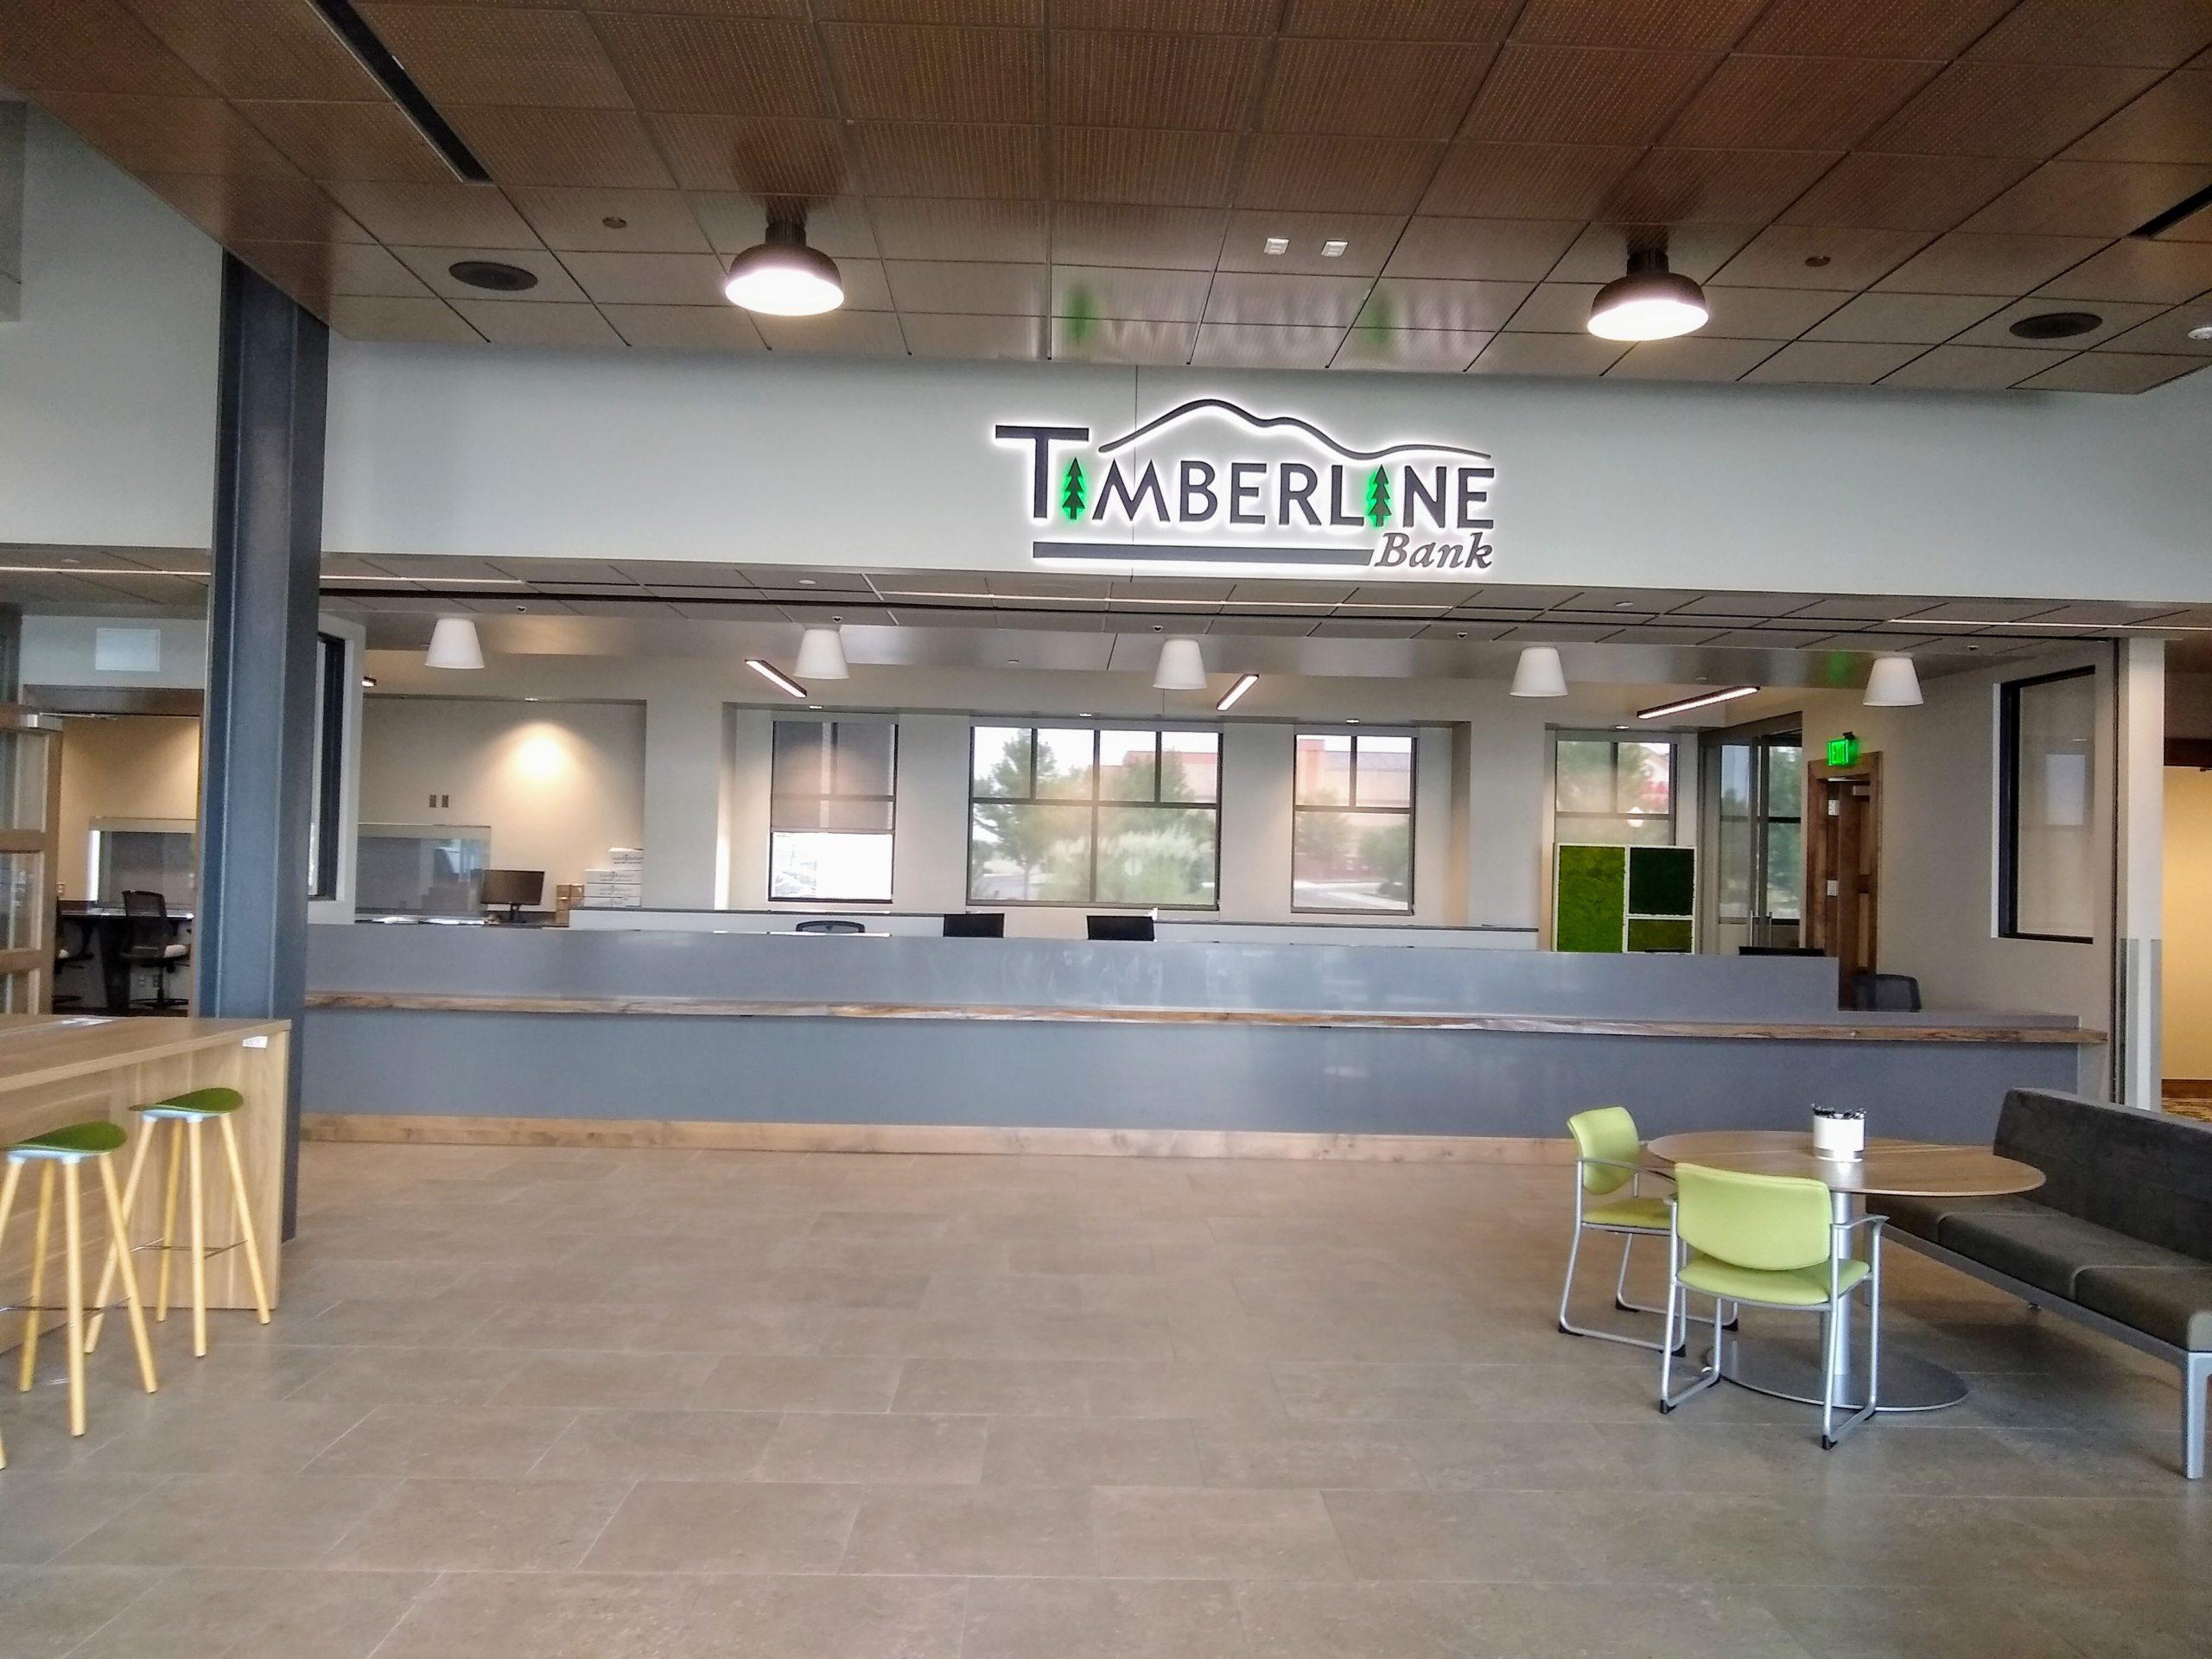 Timberline Bank teller line